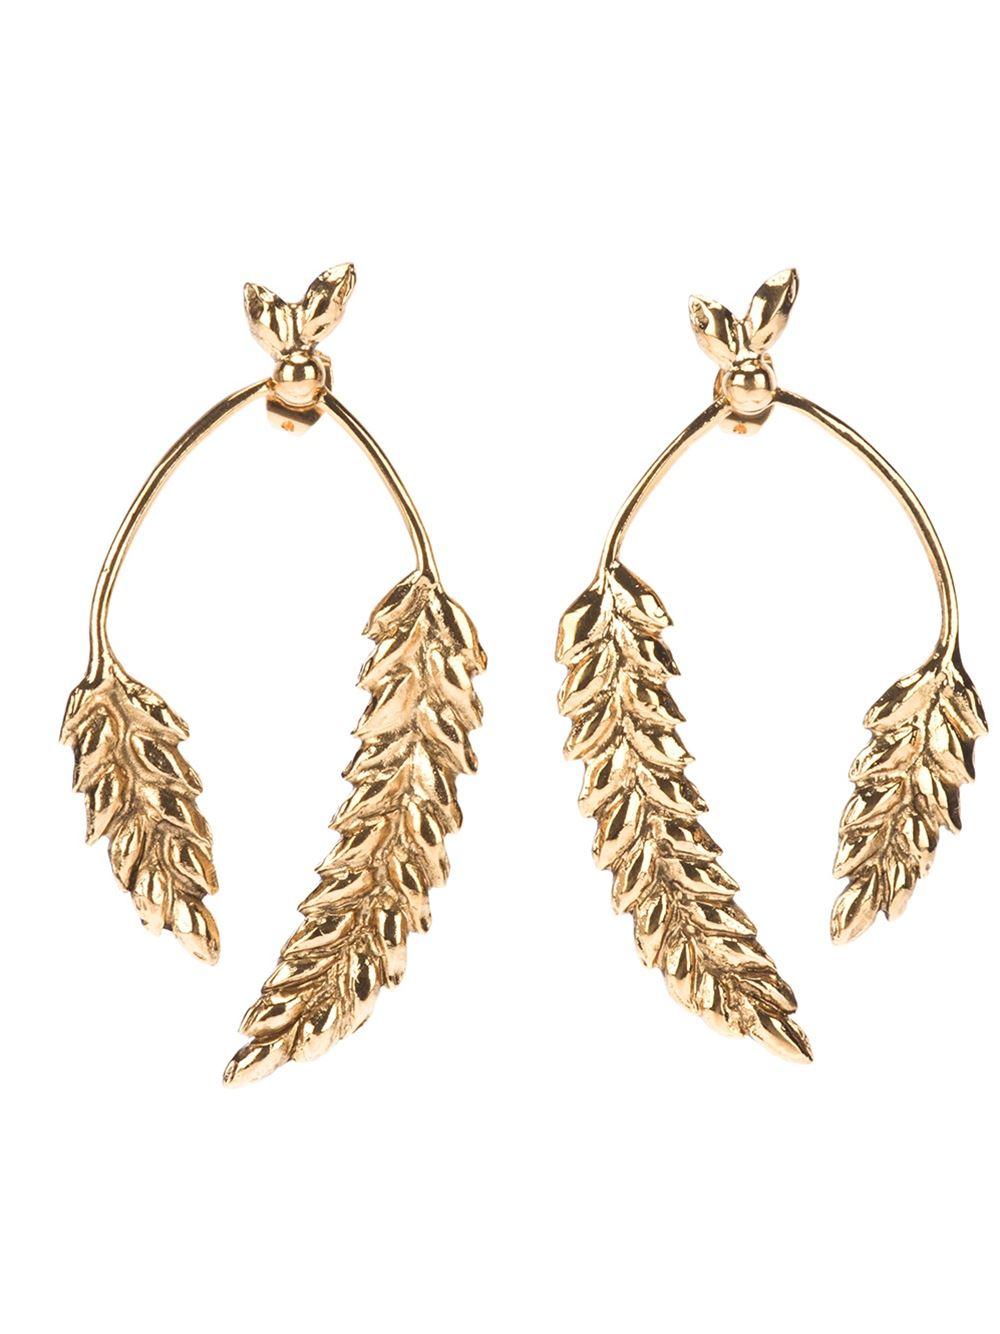 Aurelie Bidermann Wheat earrings | Shop Heaven Has Heels